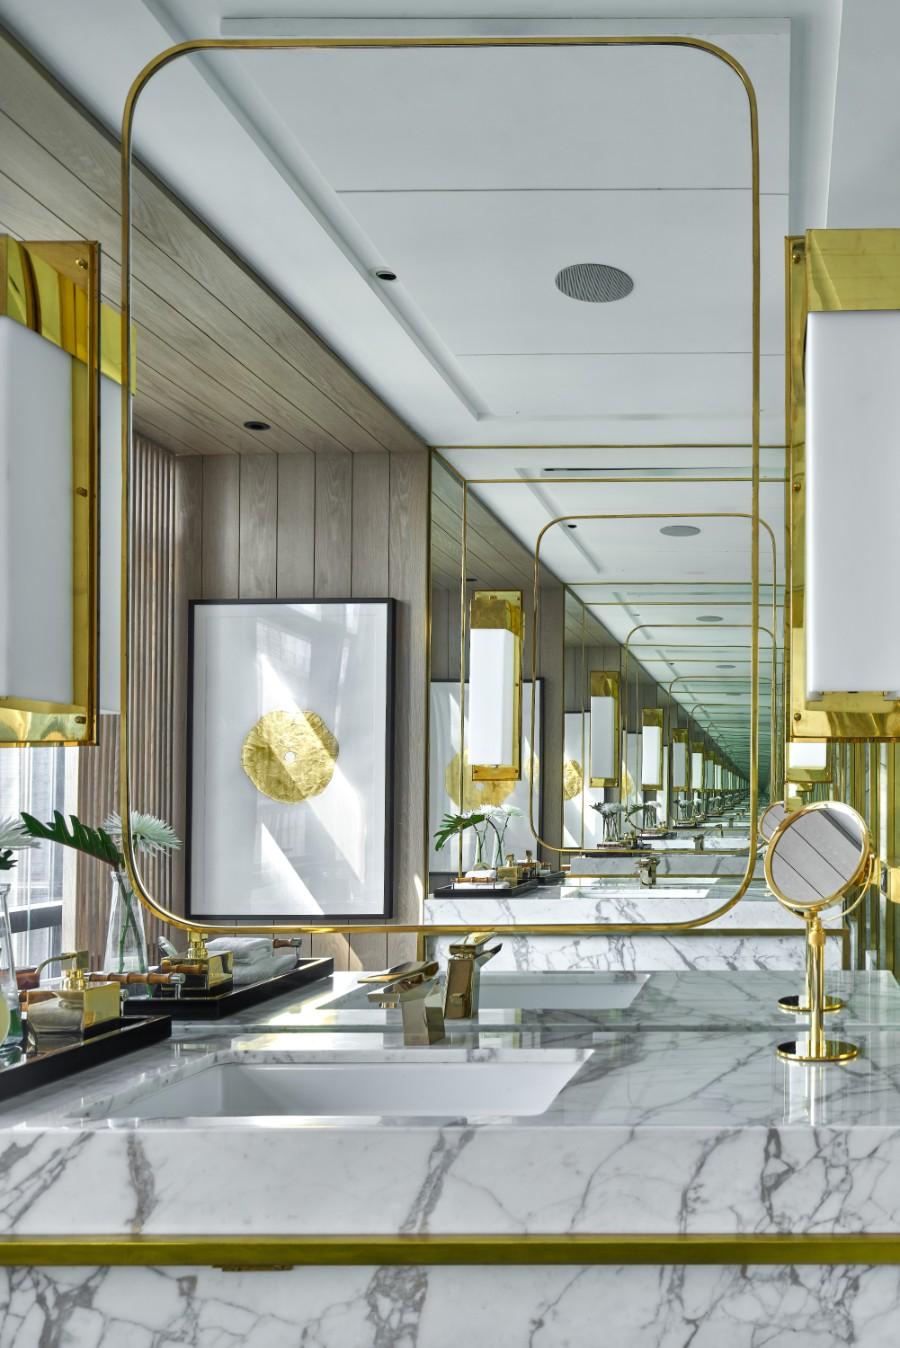 exclusive design Exclusive Design: Altamount Residence by Hirsch Bedner Associates Inside Altamount Residence by Hirsch Bedner Associates 26